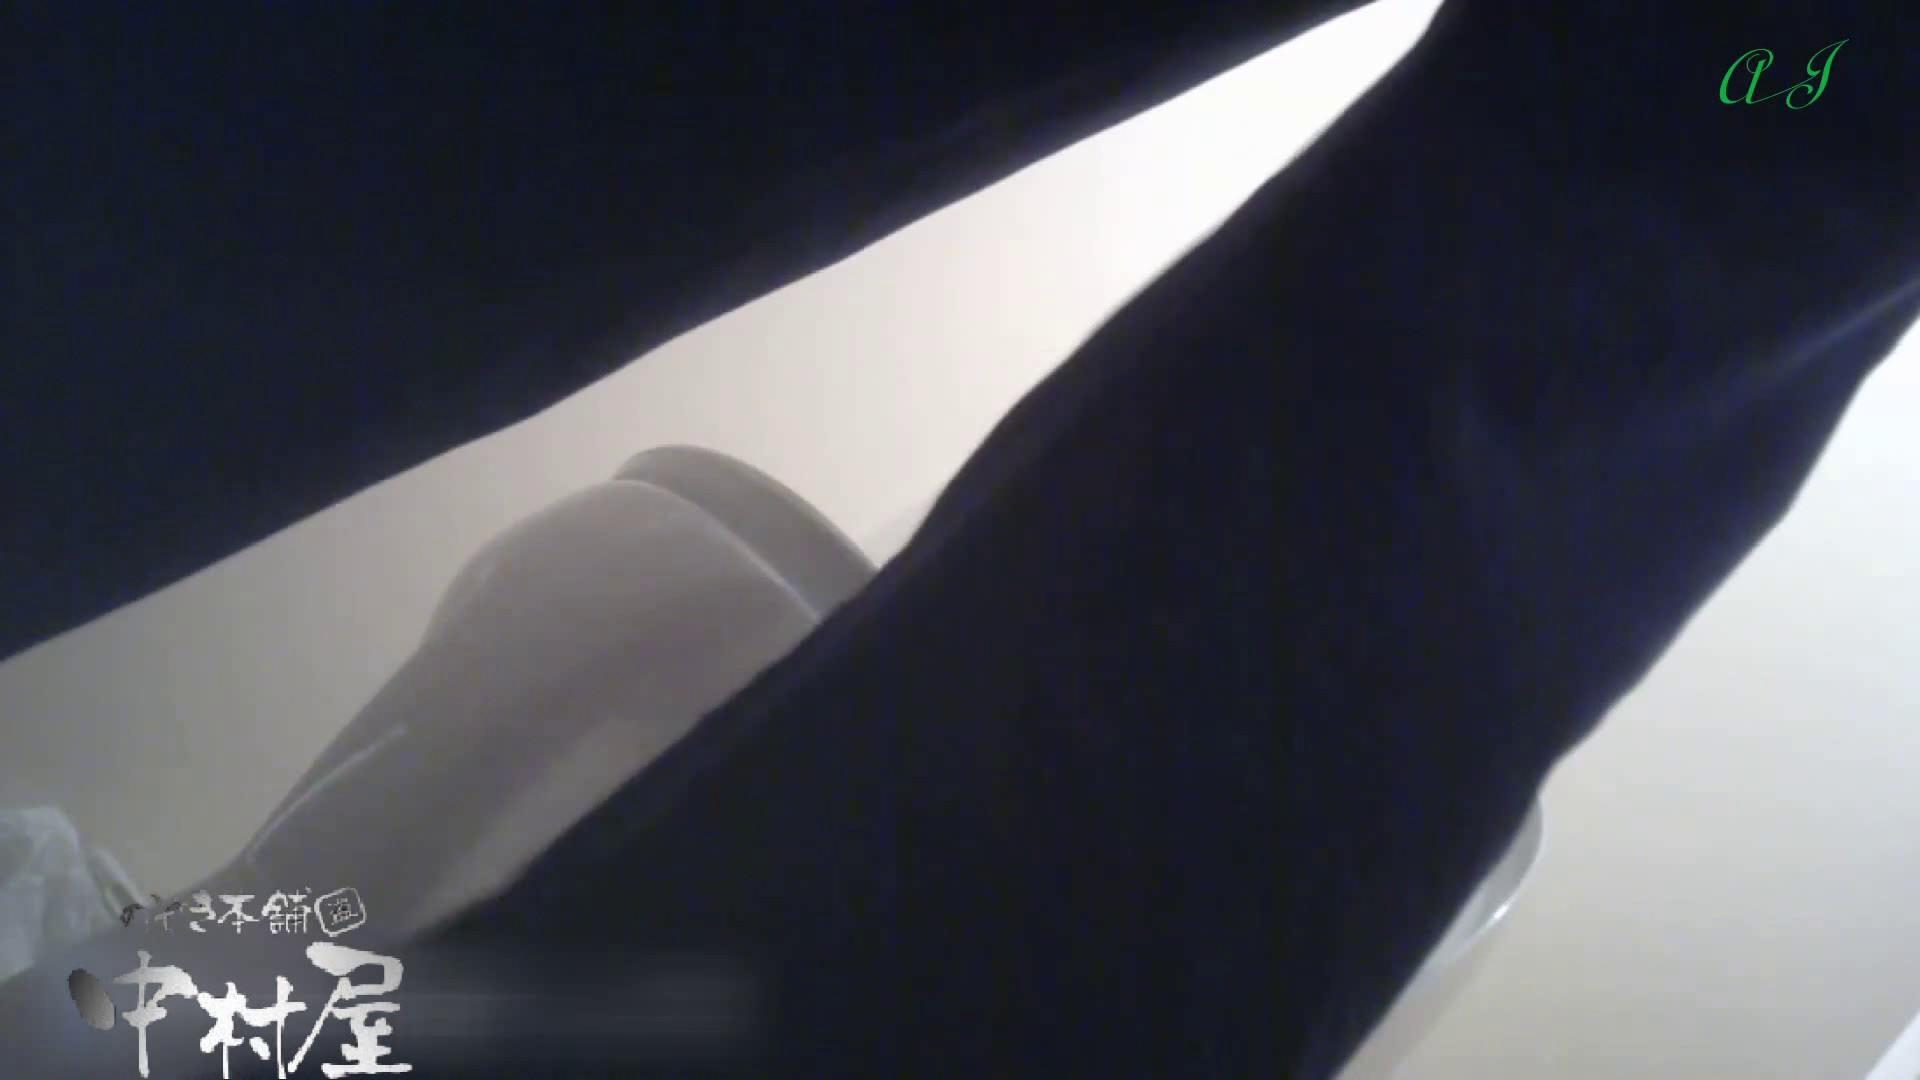 新アングル 4名の美女達 有名大学女性洗面所 vol.76 和式 盗み撮り動画 98PIX 87